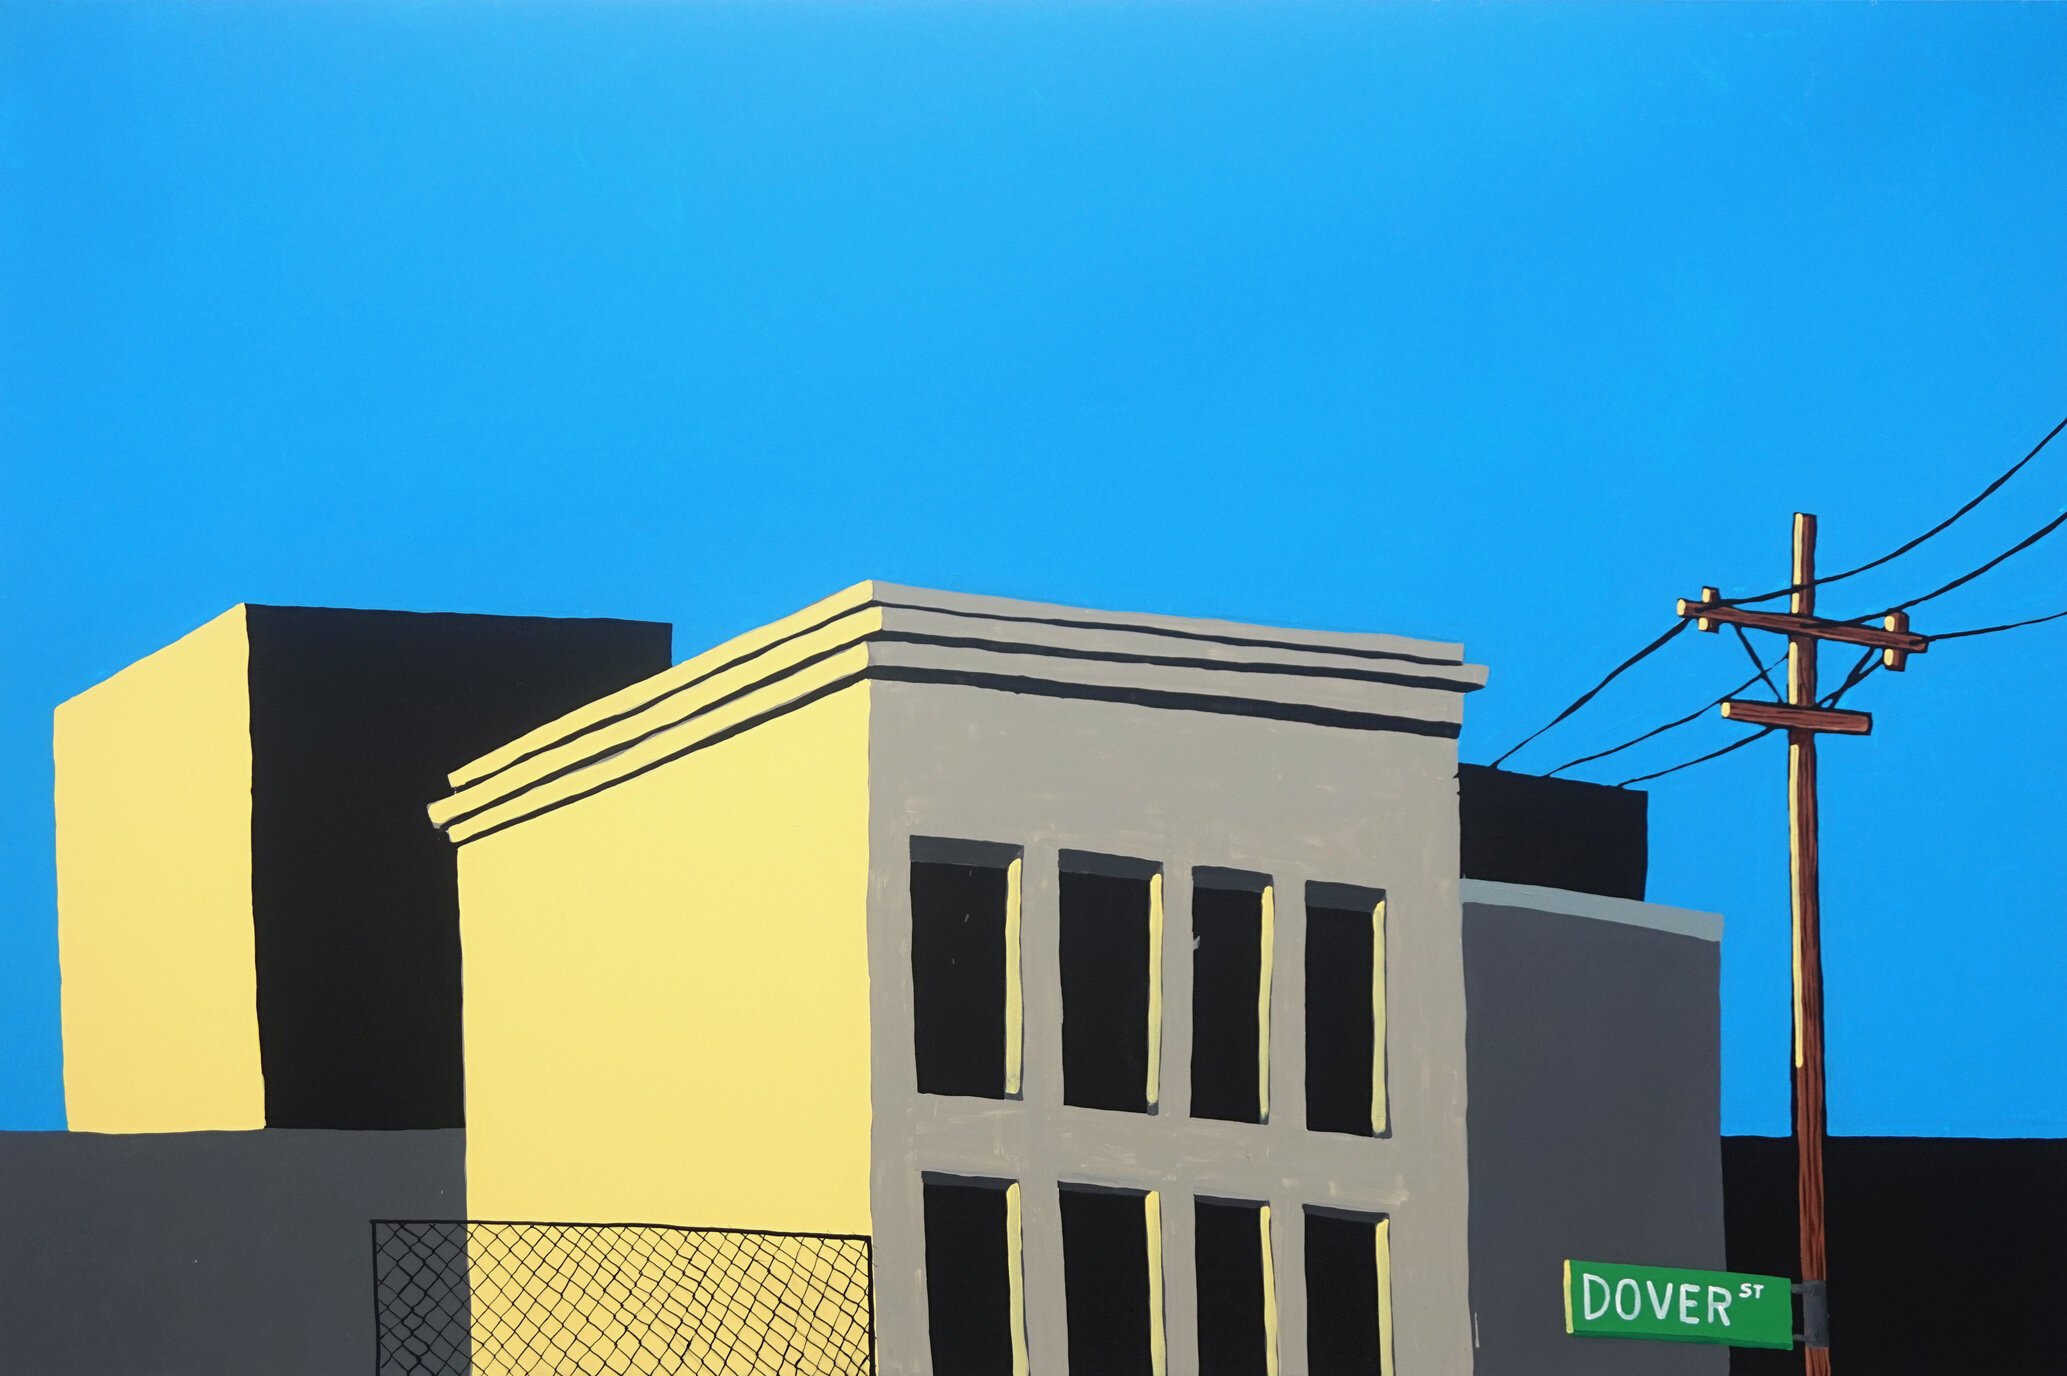 doverstreet, 2017, acrylic on canvas, 200 x 300 cm